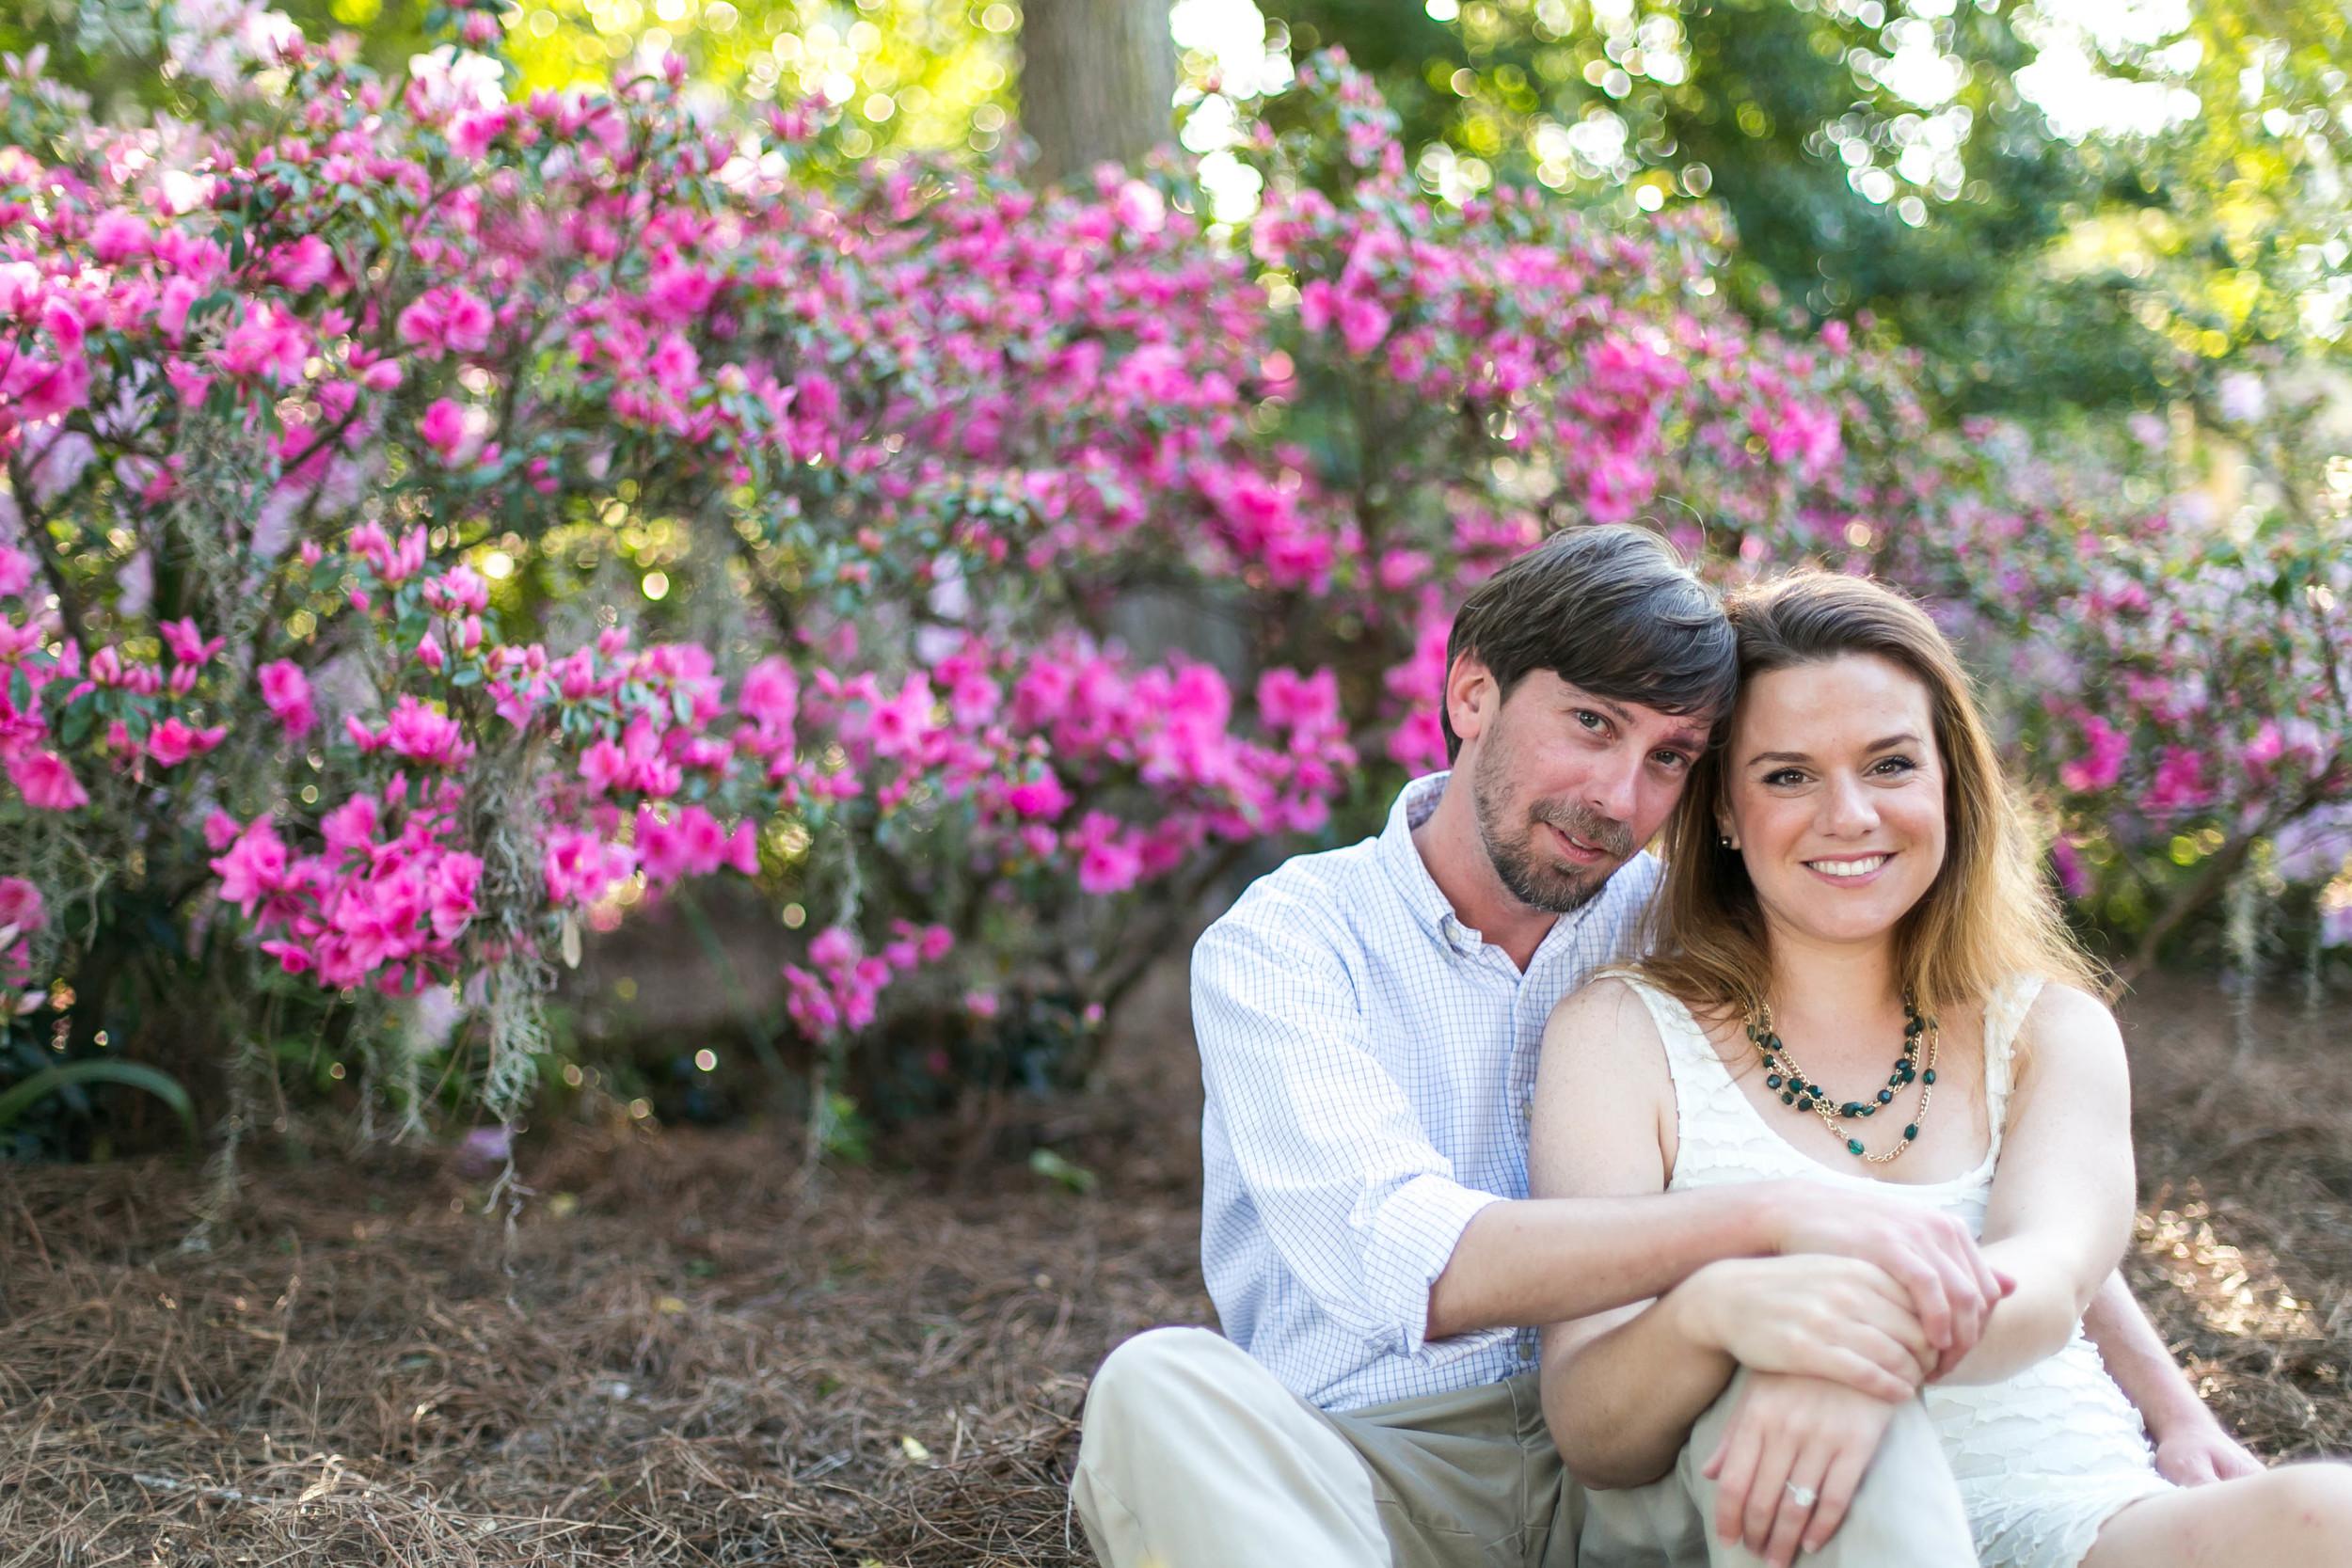 adam-szarmack-riverside-jacksonville-engagement-photographer-586A7640.jpg